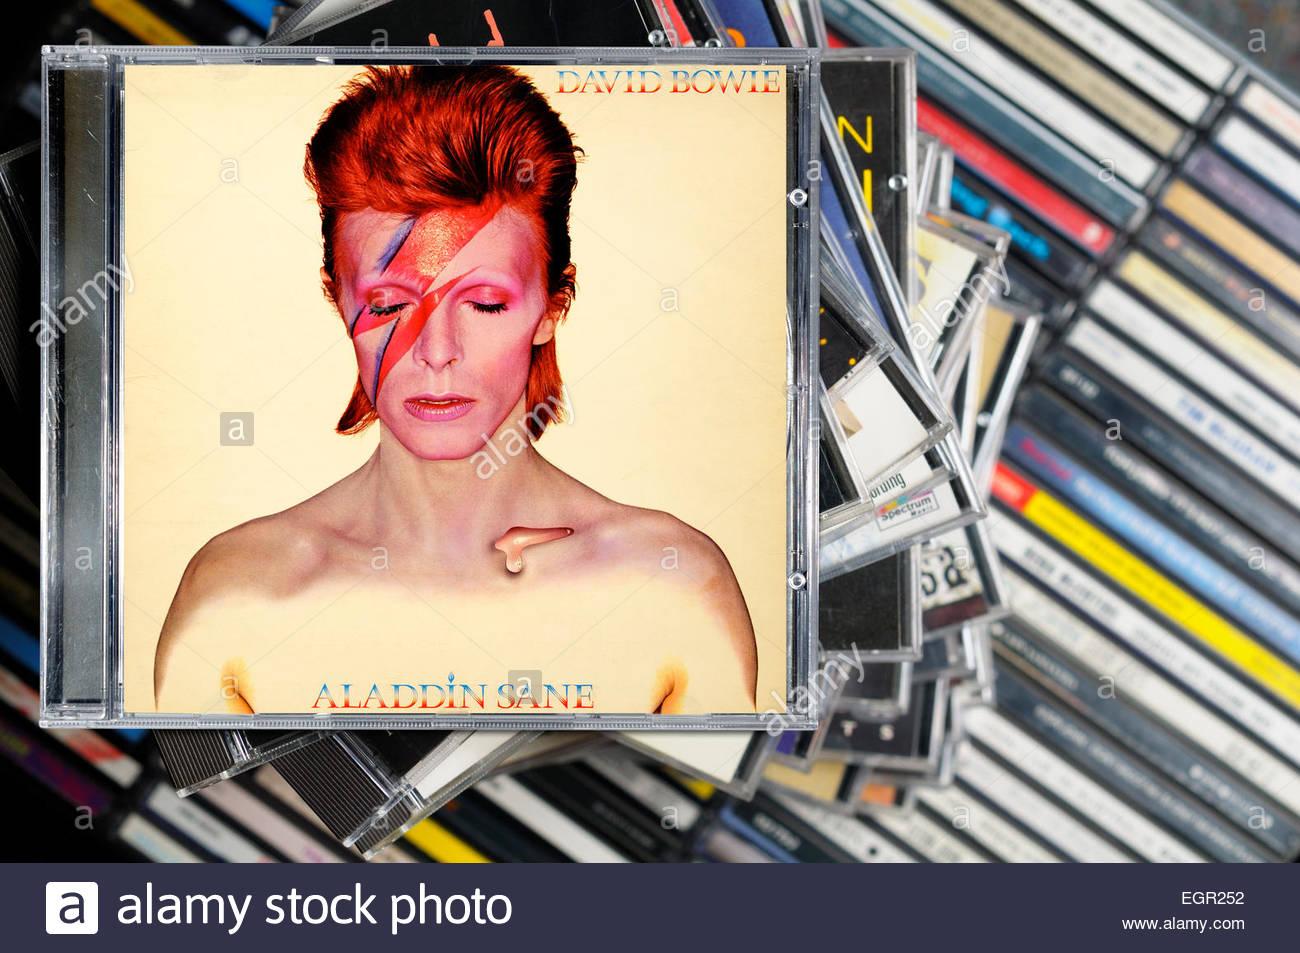 Aladdin Sane David Bowie Stock Photos & Aladdin Sane David Bowie ...